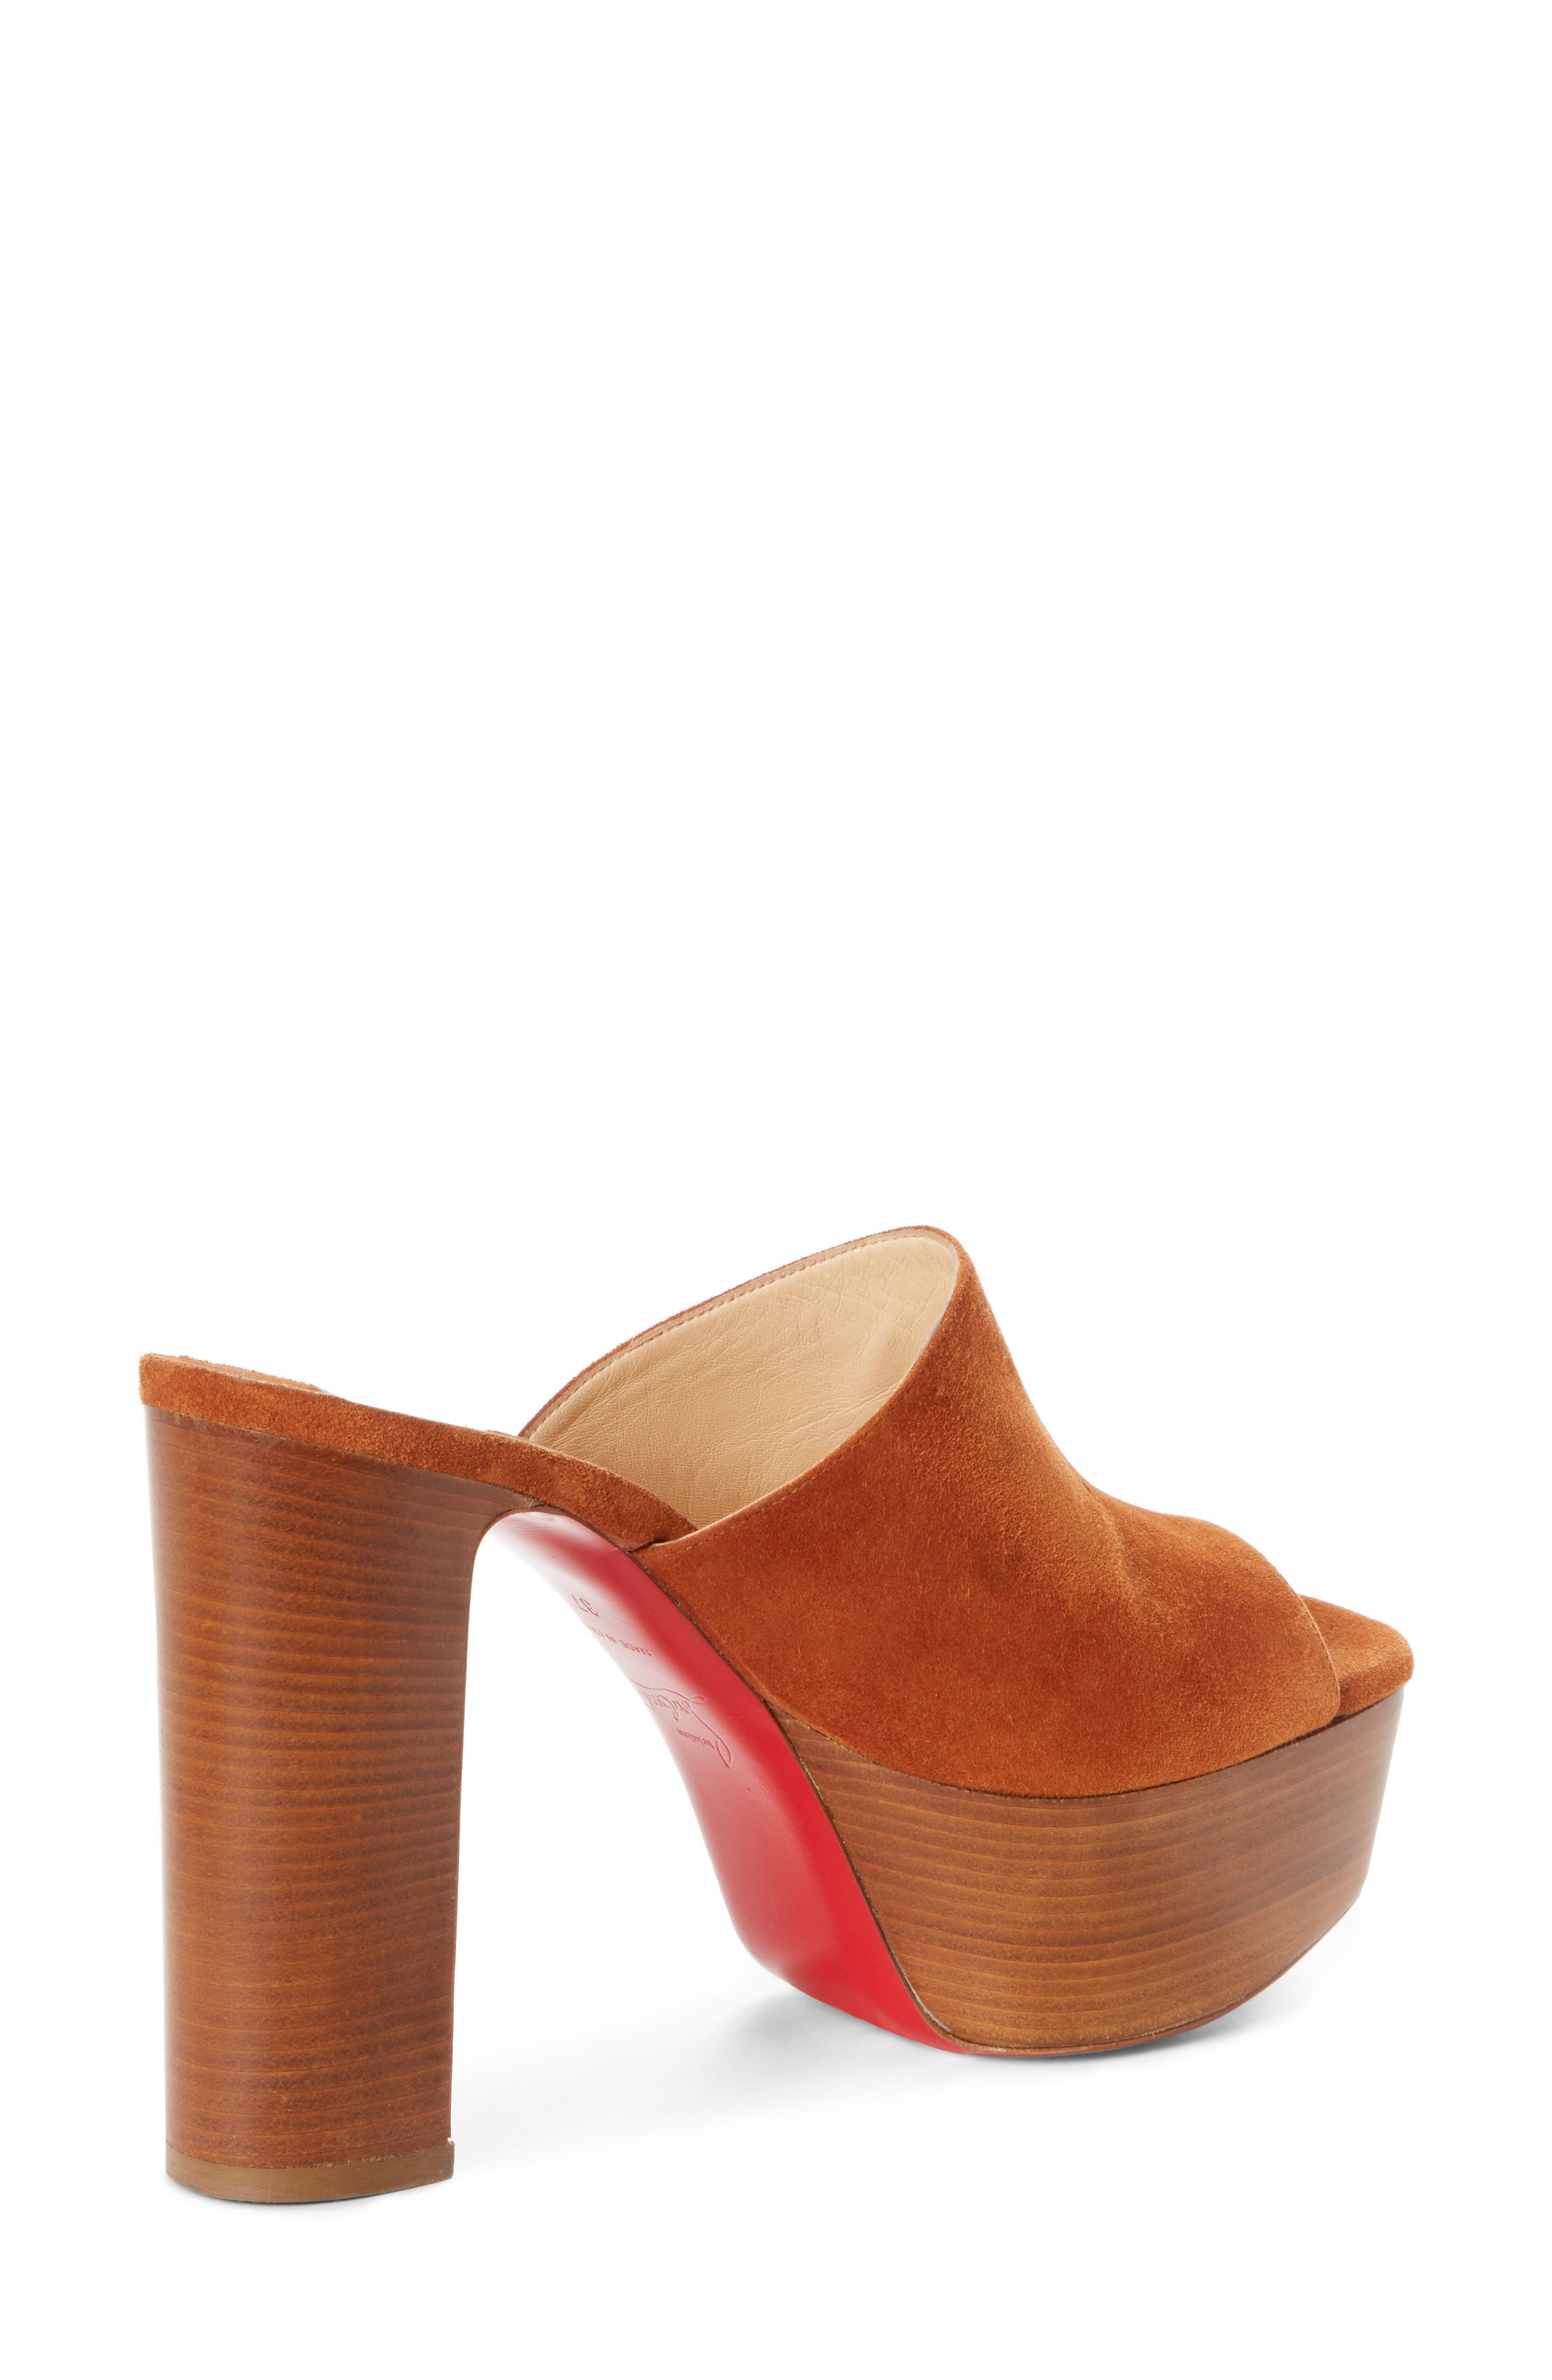 Alternate Image 3  - Christian Louboutin Suede Platform Mule Sandal (Women)